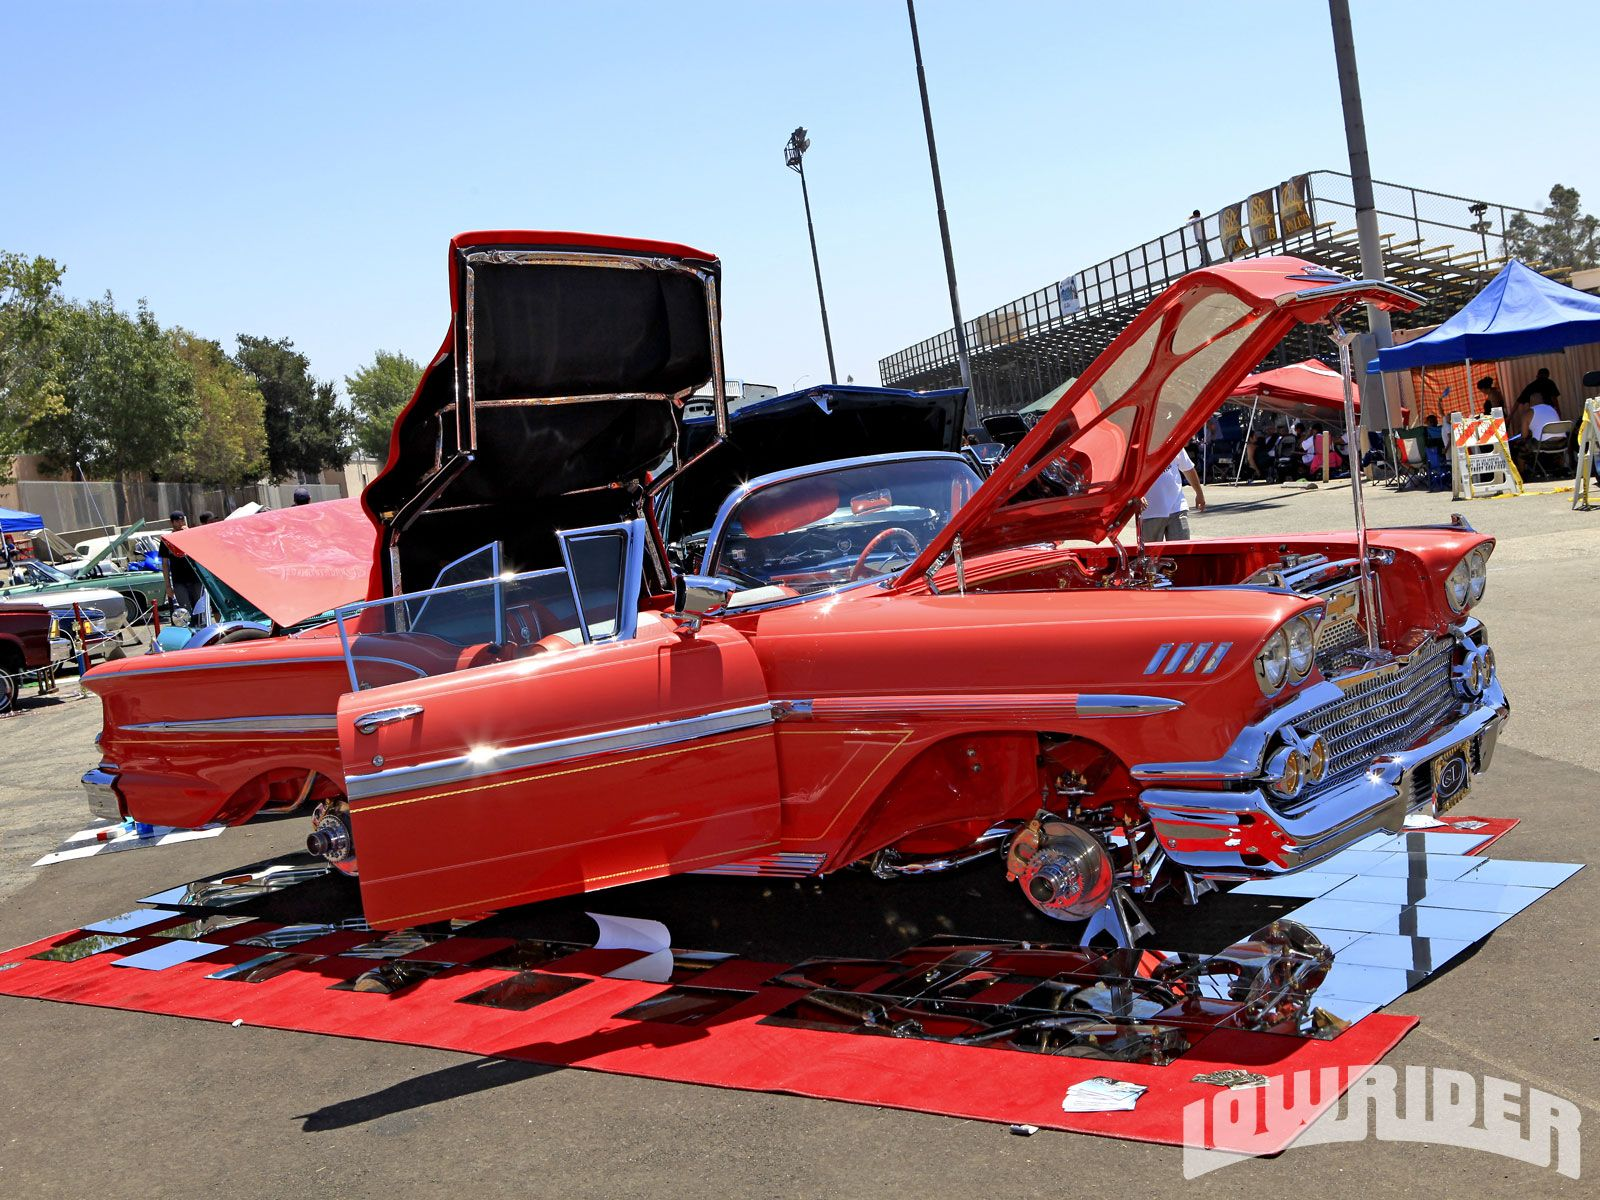 Custom Cars Wallpaper Google Search Lowriders Car Show Custom Cars